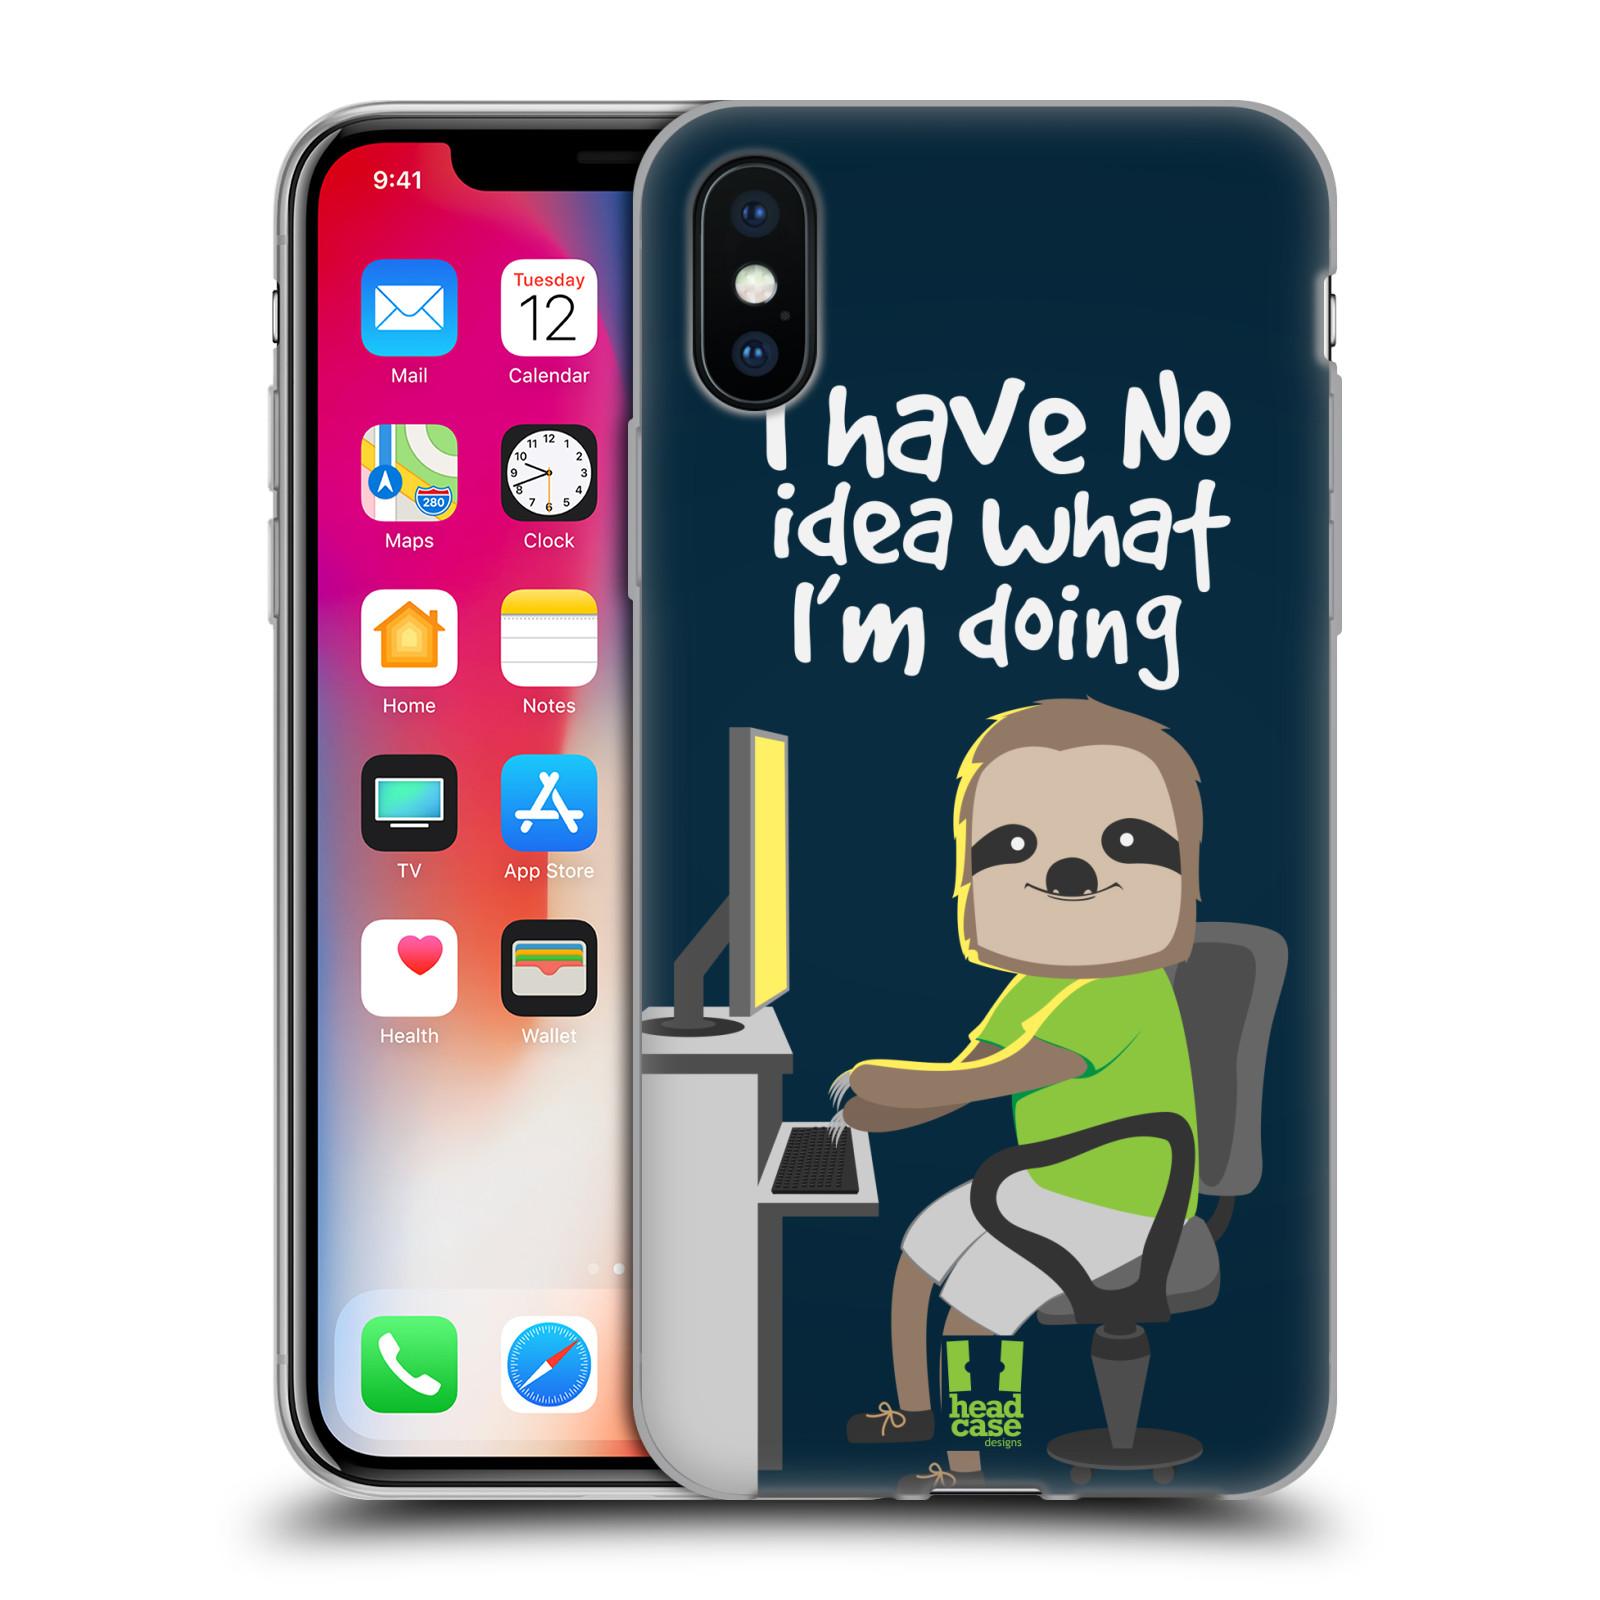 HEAD-CASE-DESIGNS-MR-SLOTH-SOFT-GEL-CASE-FOR-APPLE-iPHONE-PHONES